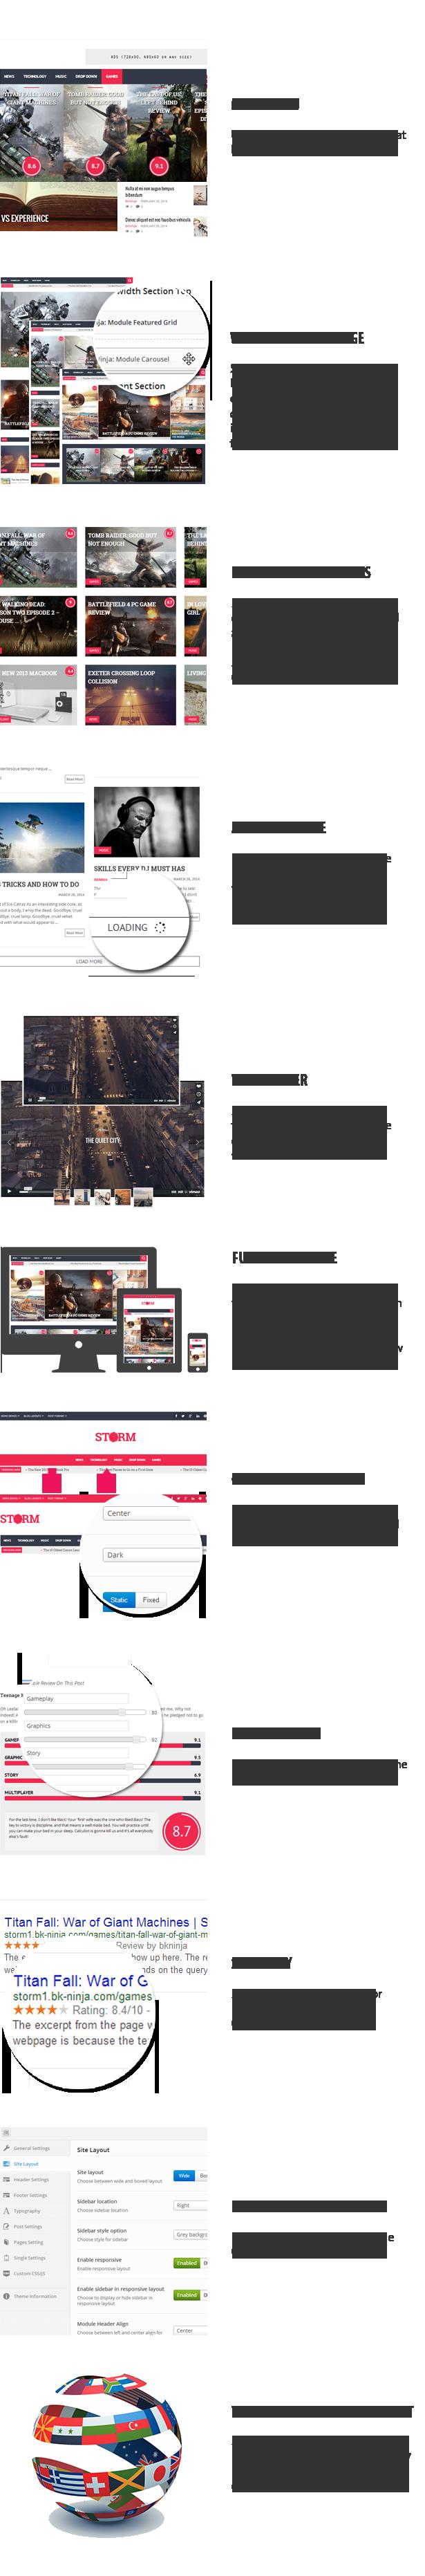 storm2 - Storm - Clean Magazine & Blog Theme